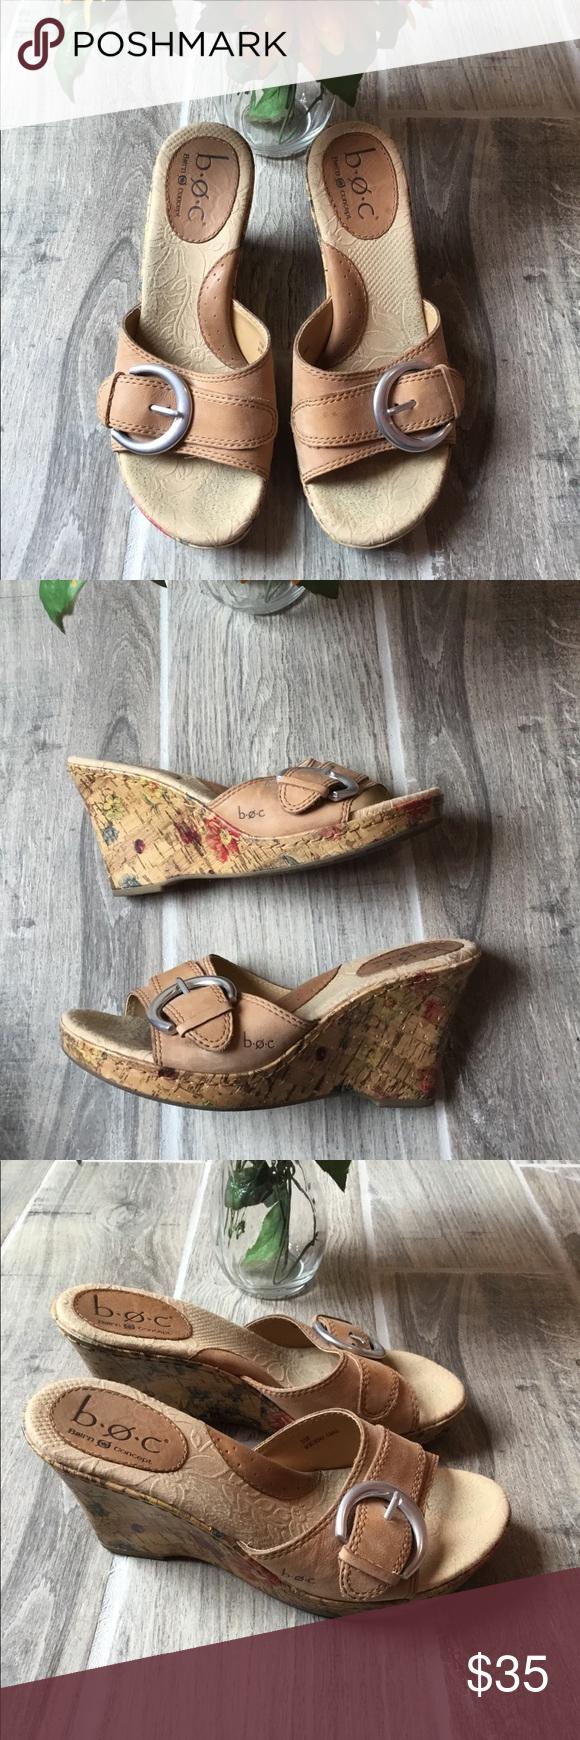 BORN Slide In Tan Wedge Sandals Sz 7 Adorable Born Wedge